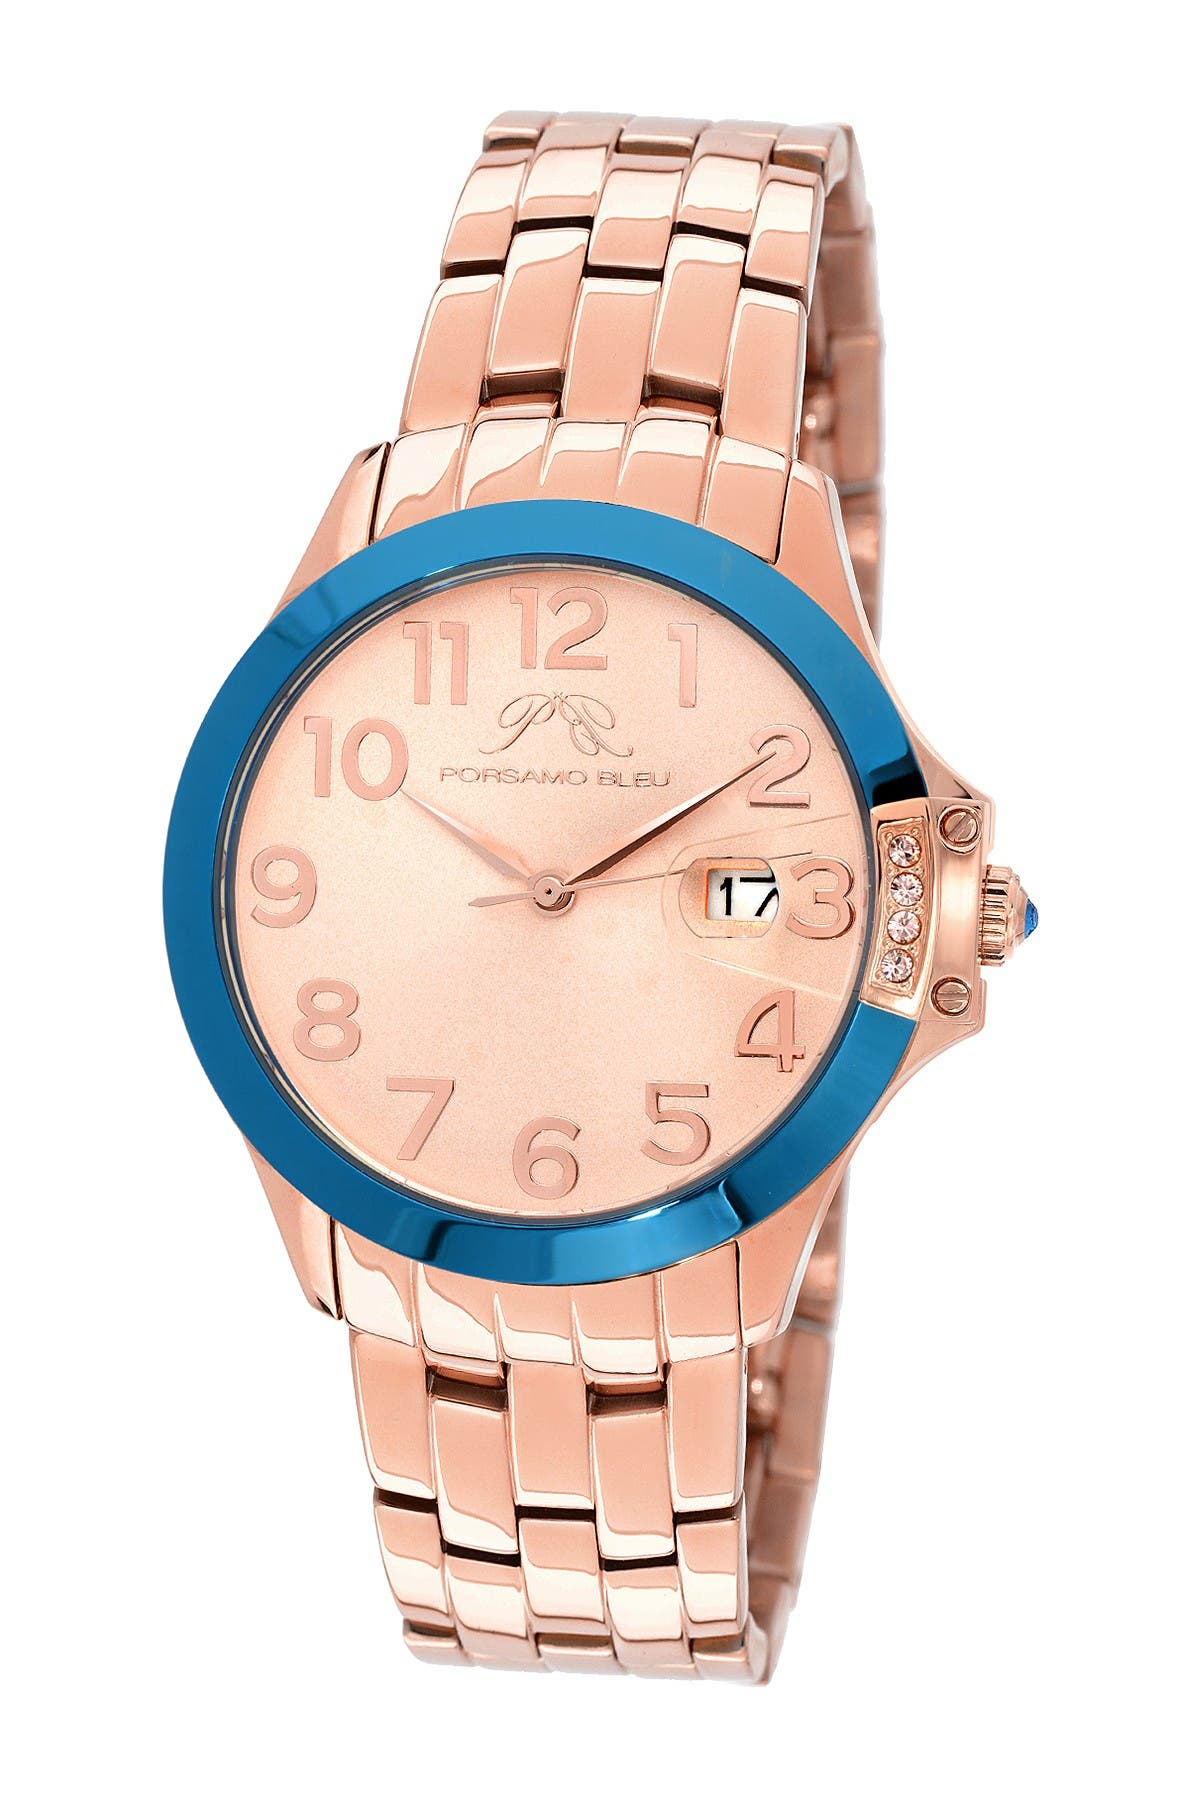 Image of Porsamo Bleu Women's Olivia Swarovski Crystal Accented Quartz Watch, 40mm